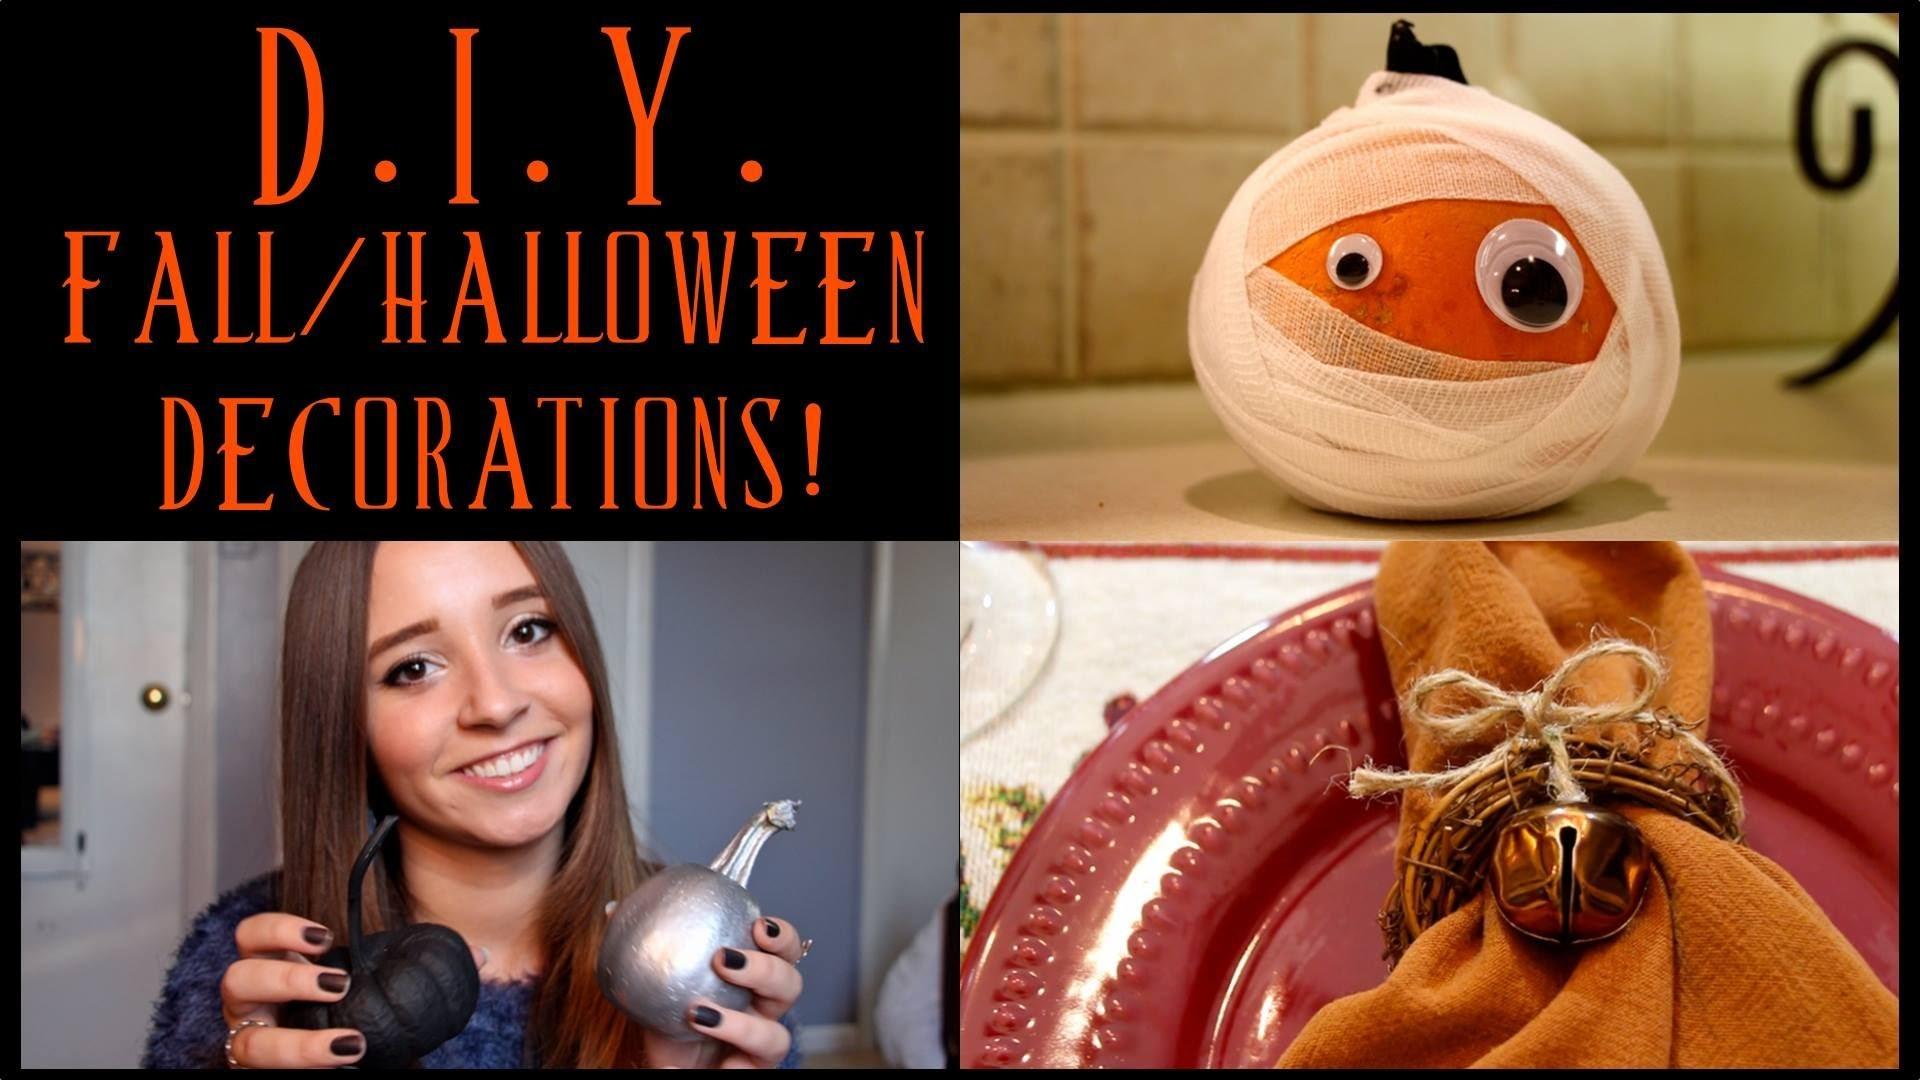 DIY Fall & Halloween Decorations! - Ali Brustofski